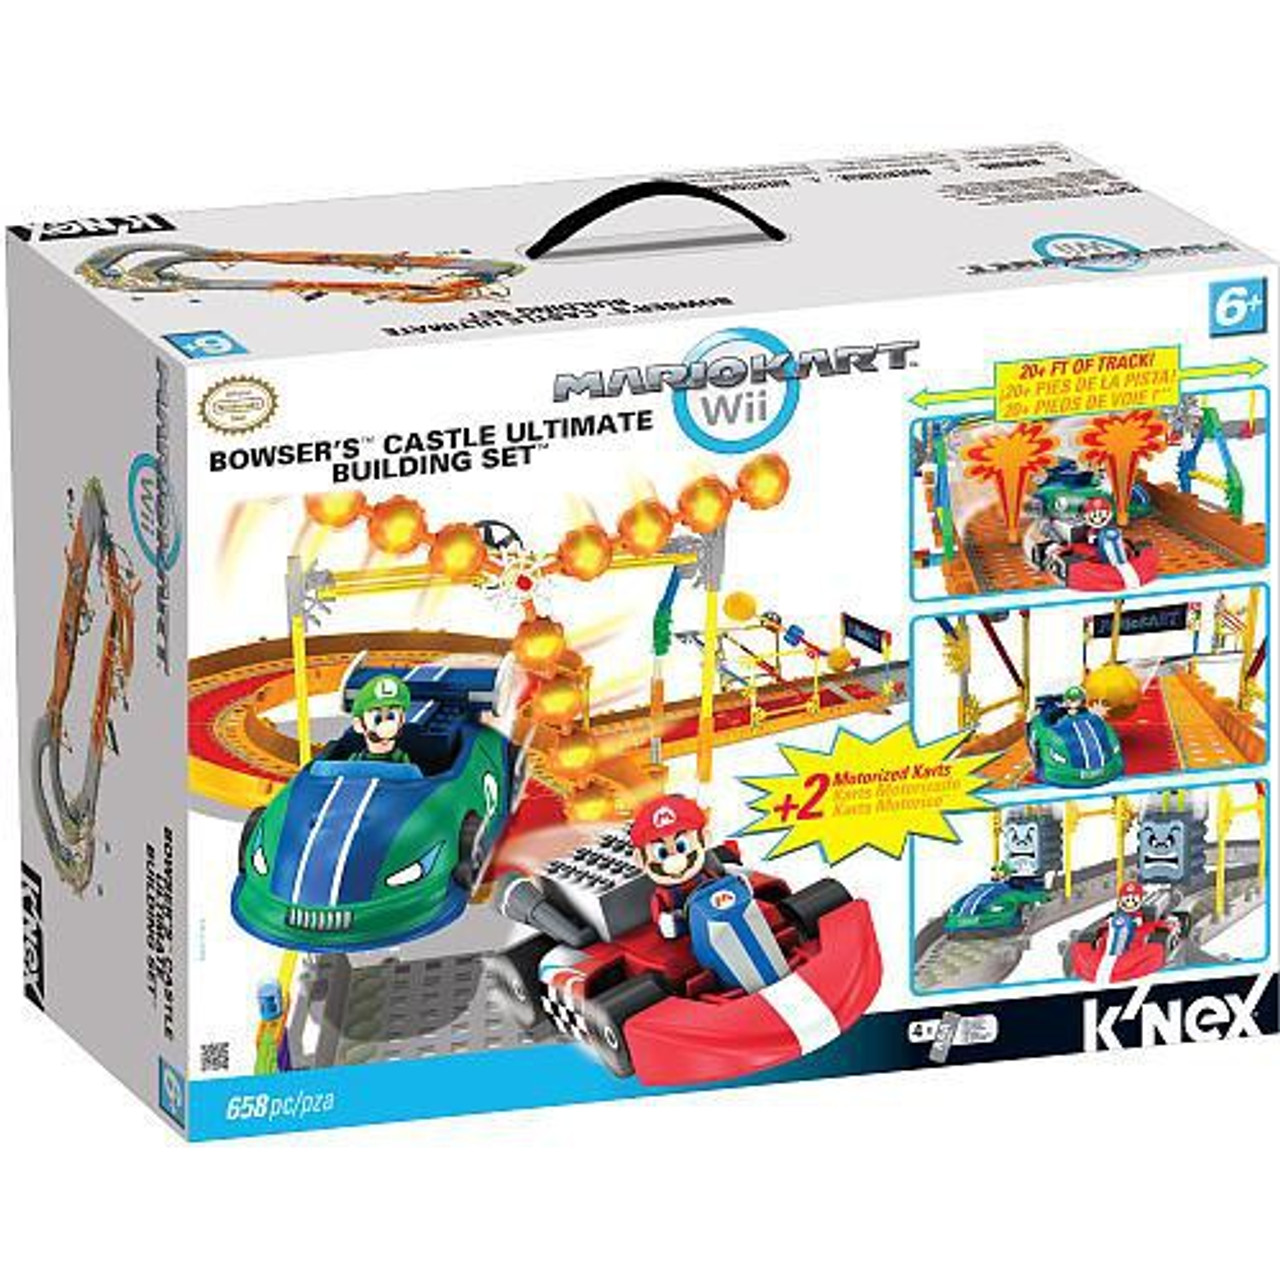 K Nex Super Mario Mario Kart Wii Bowser S Castle Ultimate Building Set Set 38437